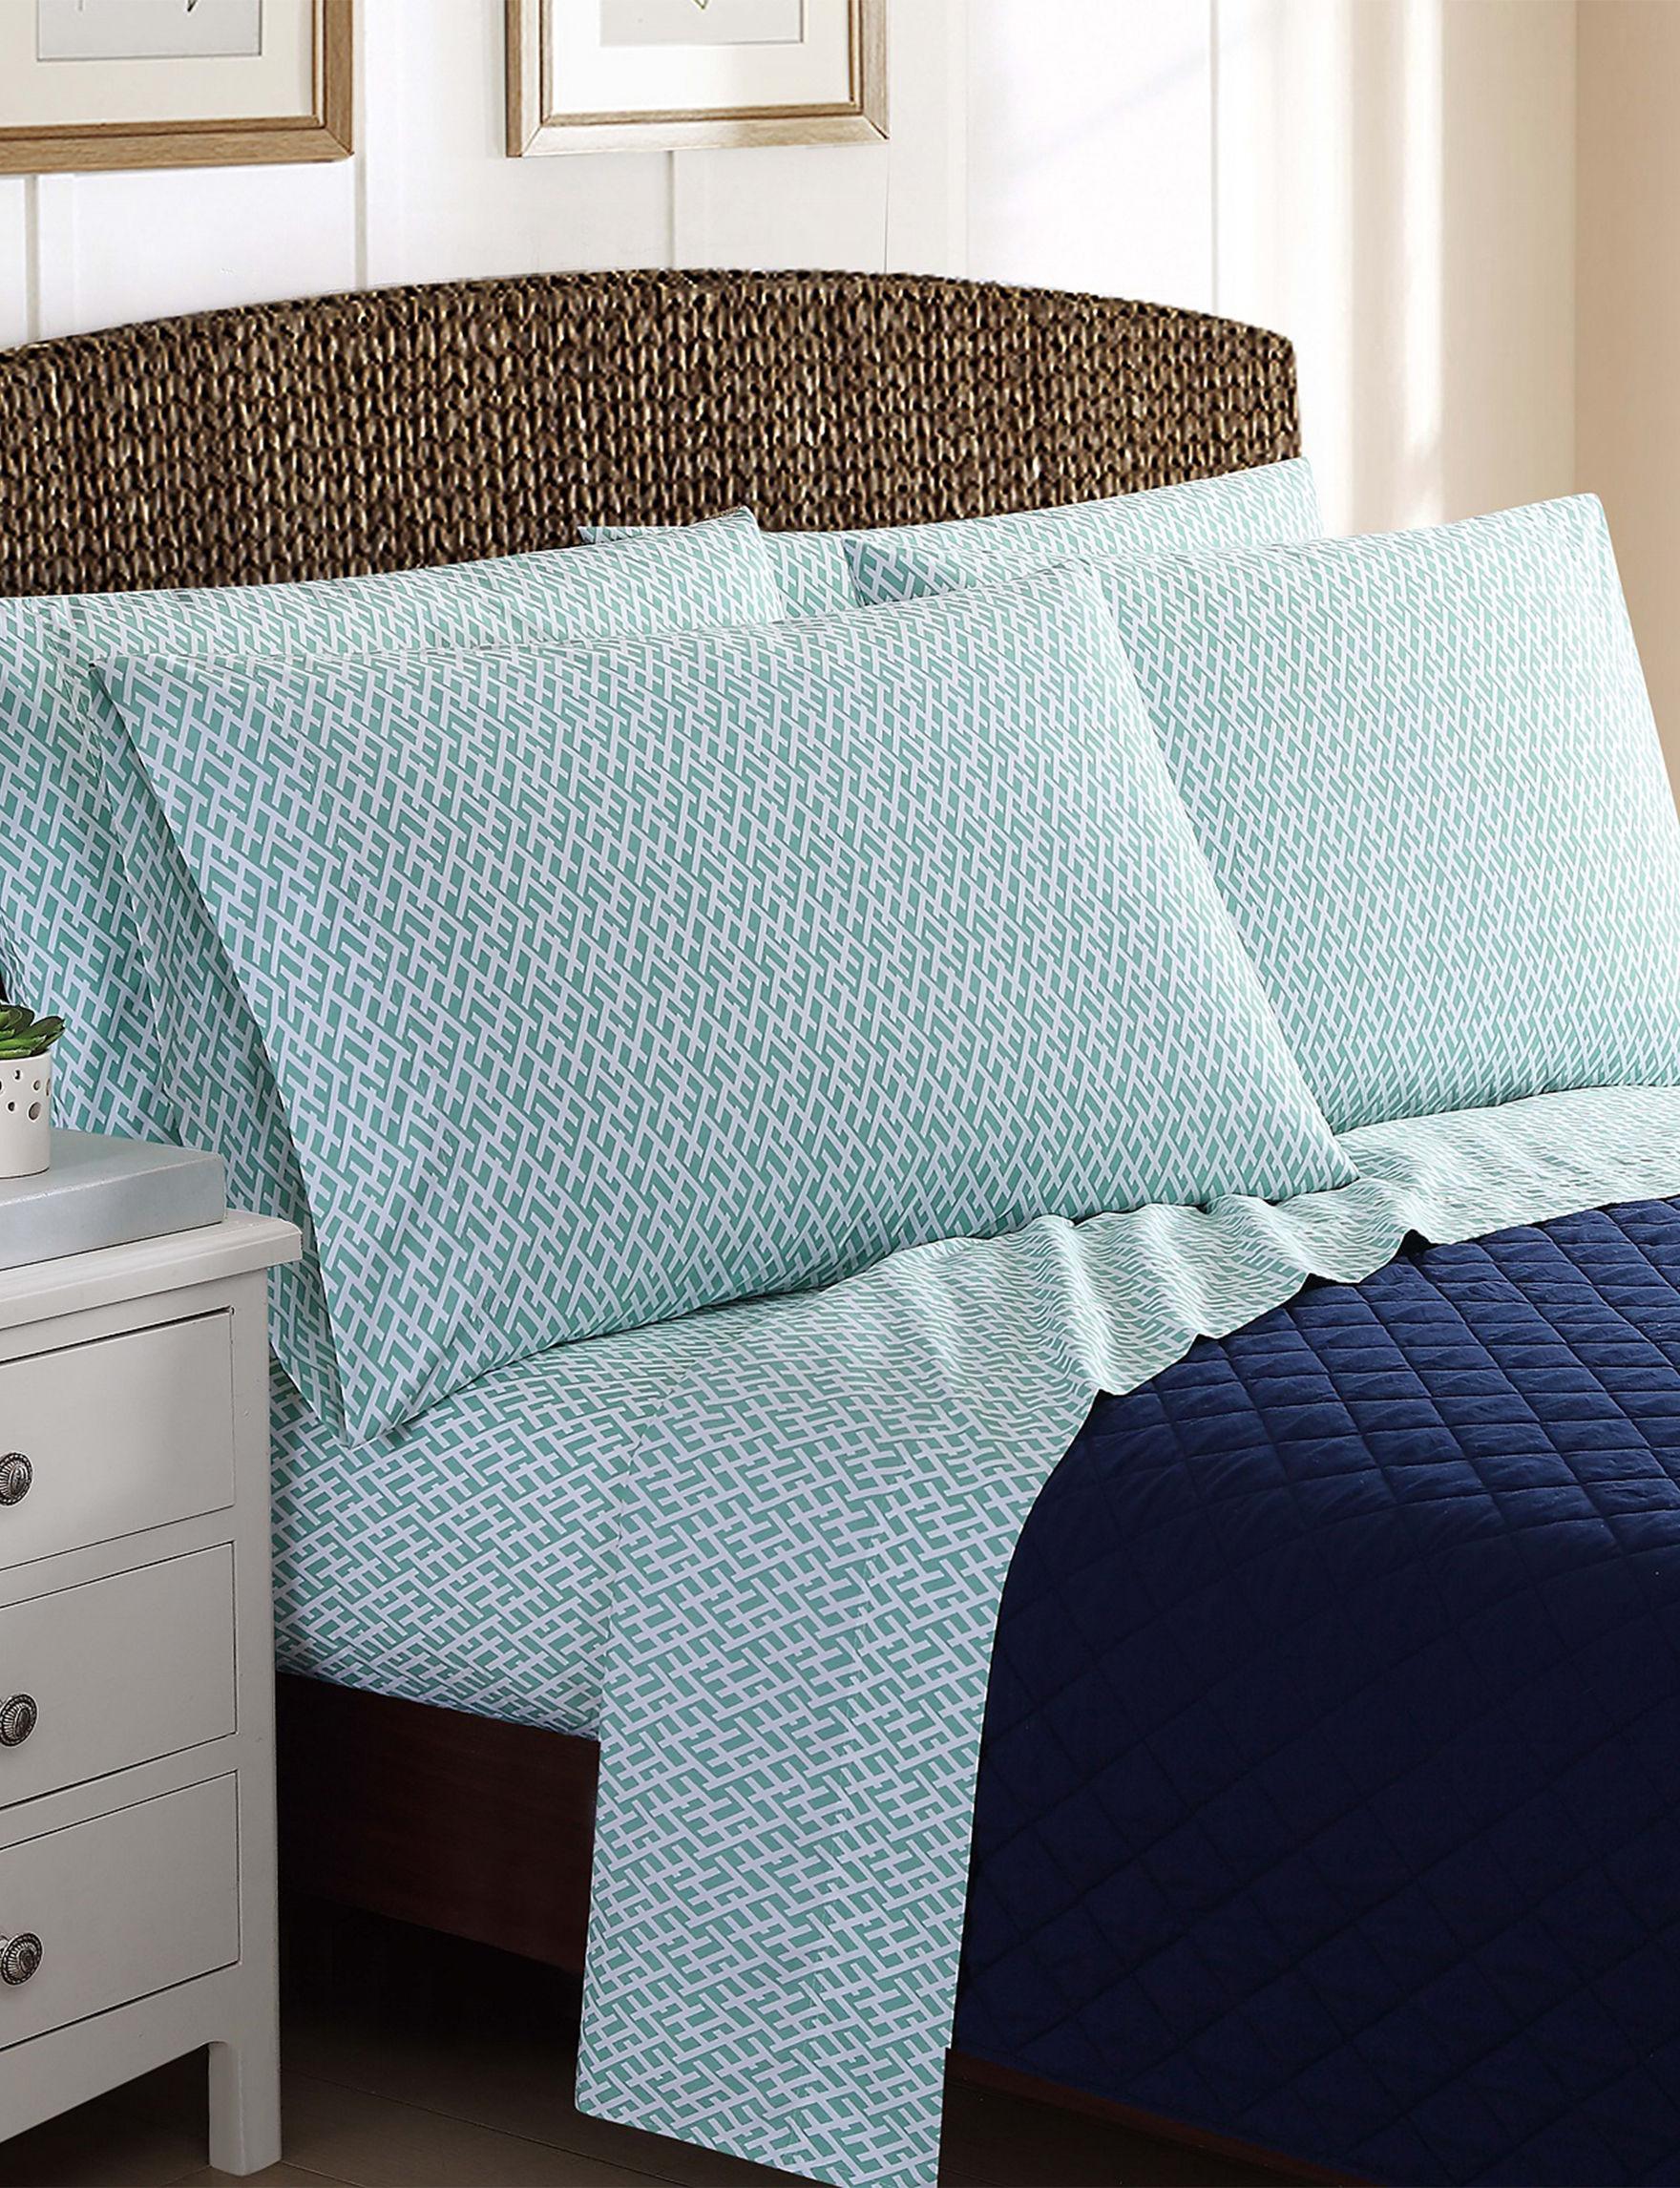 Oceanfront Resort Teal Sheets & Pillowcases